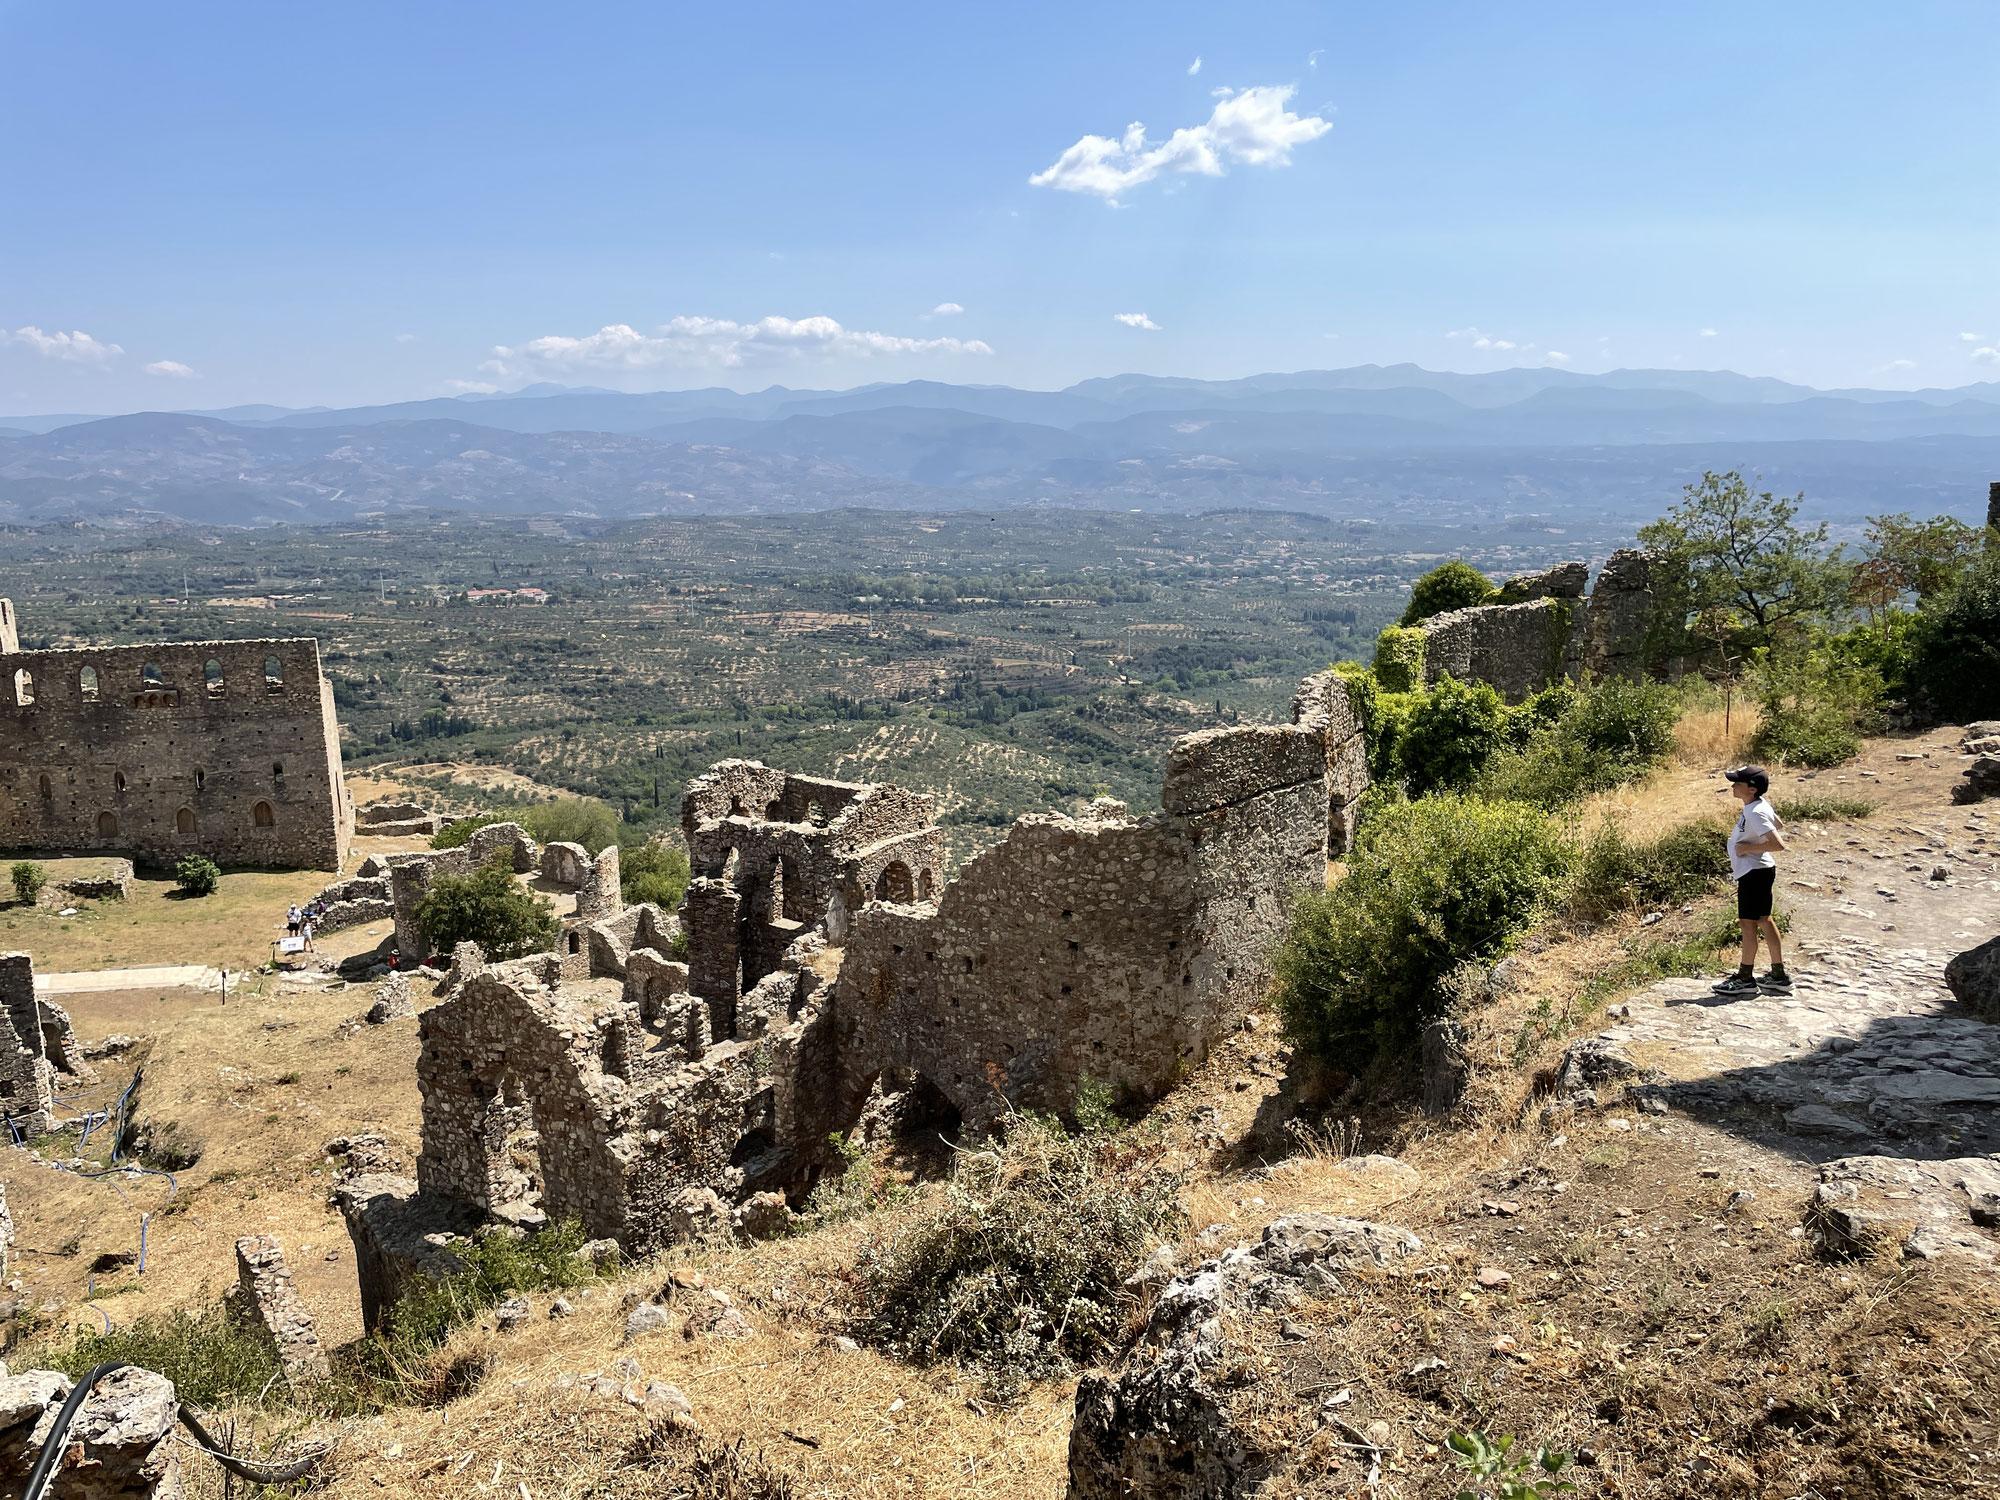 Tag 8, Mistrás und Sparta über schöne Bergstroute E82, retour bis nach Stoupa (äussere Mani)